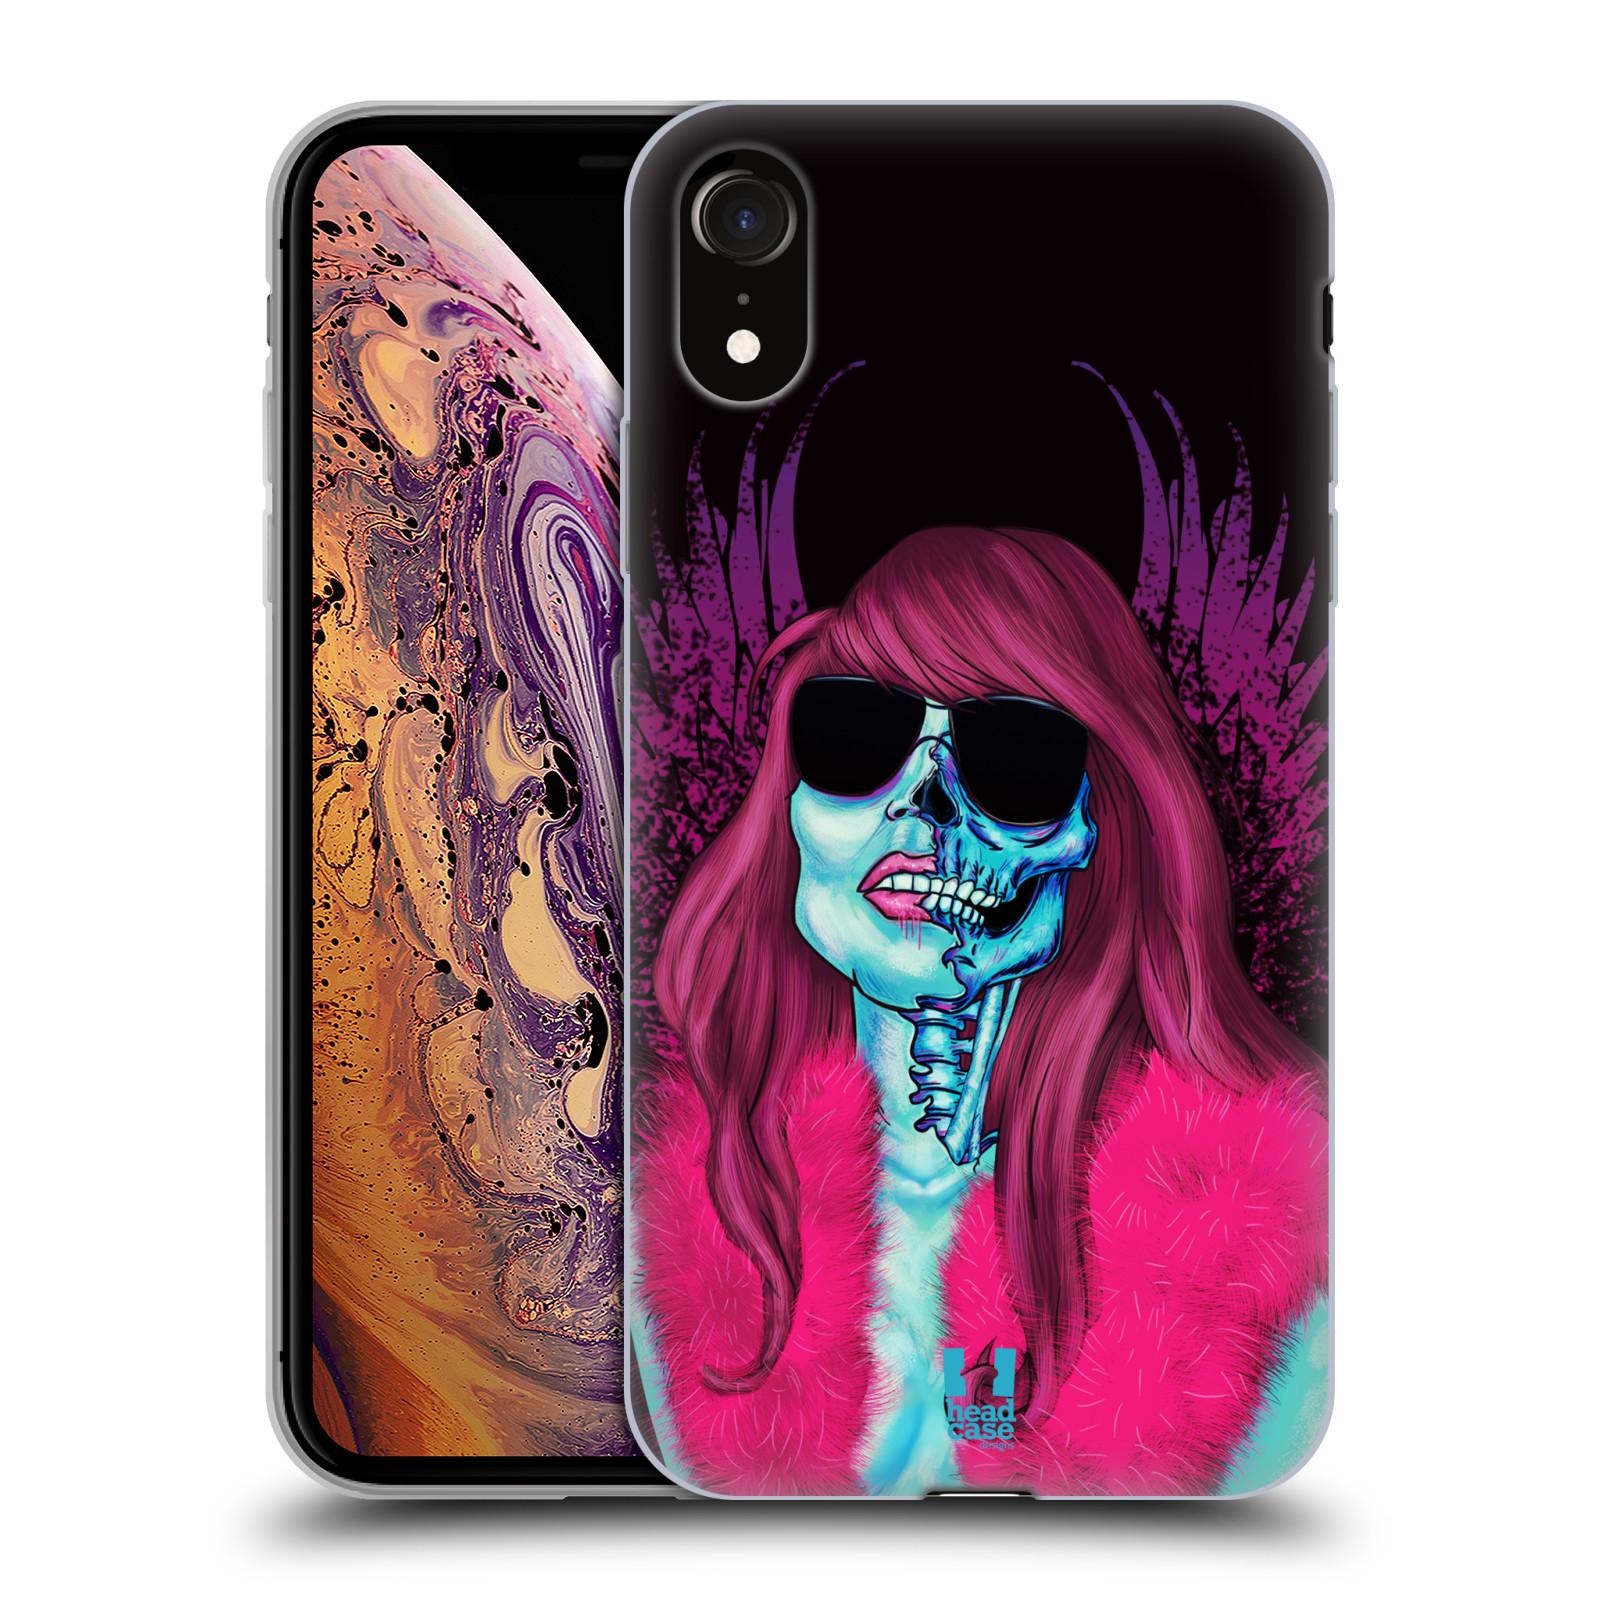 Silikonové pouzdro na mobil Apple iPhone XR - Head Case - LEBKA GROUPIE